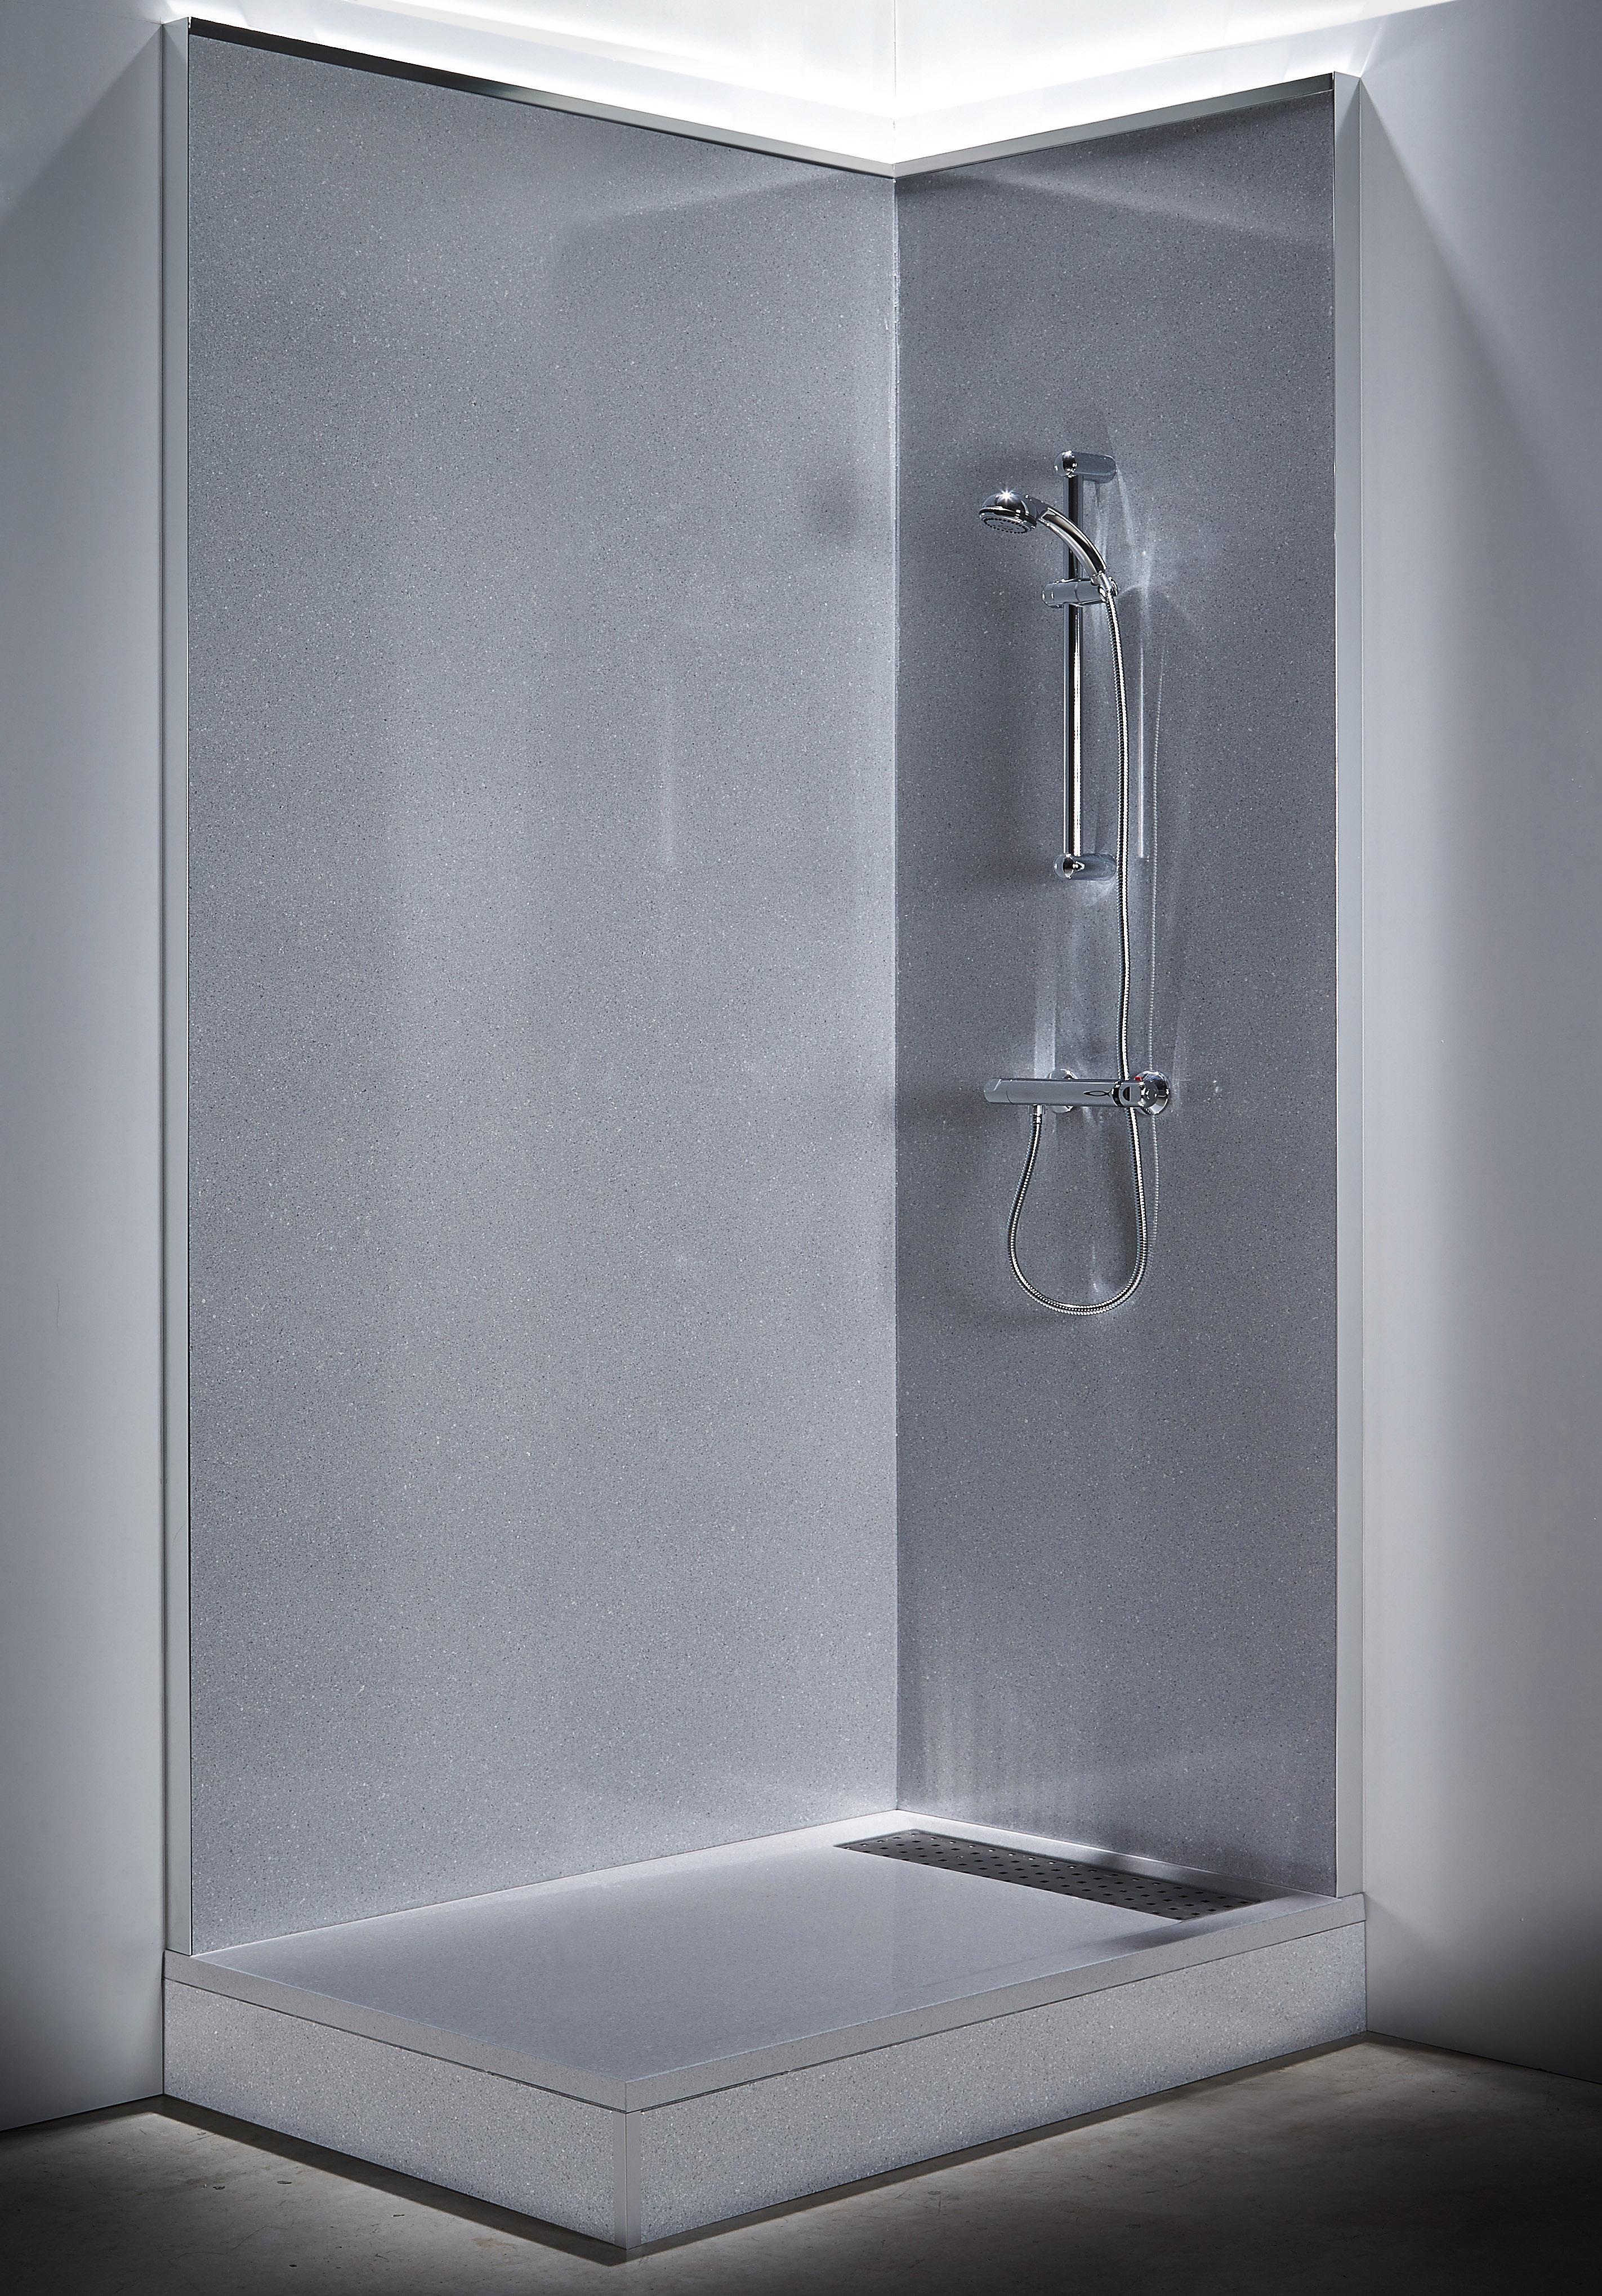 espace bain cabines de douche salle bain petit espace idee verre espace bain. Black Bedroom Furniture Sets. Home Design Ideas